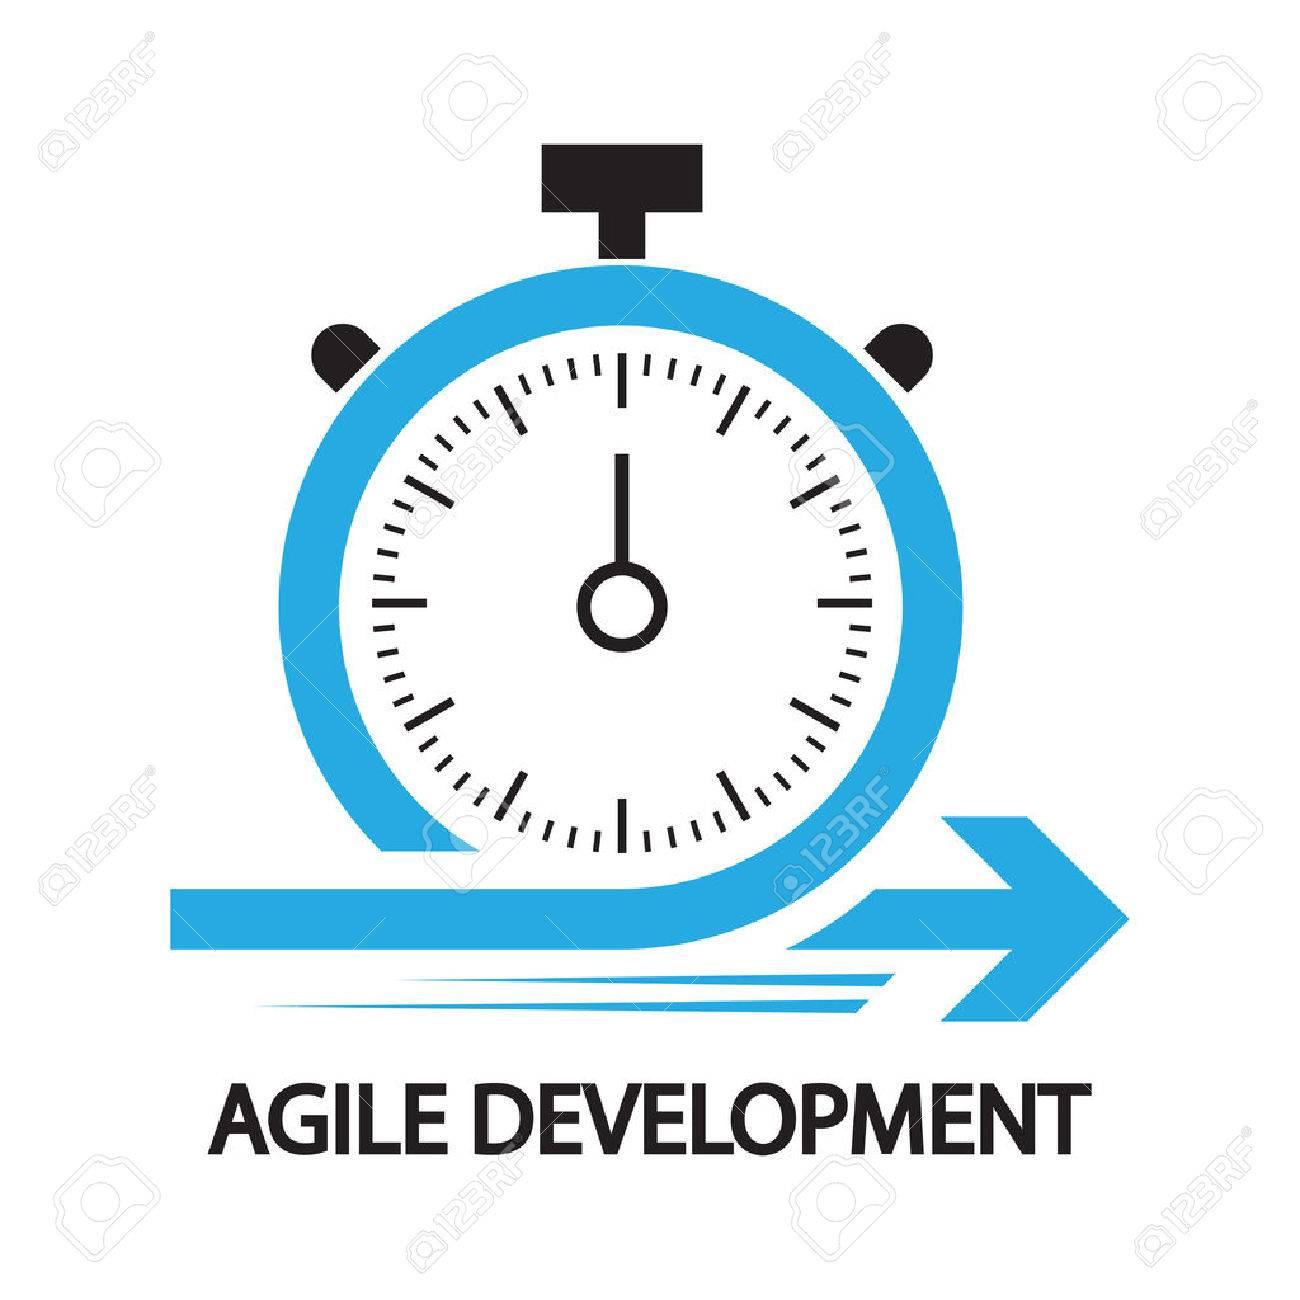 agile development,Stopwatch concept ,icon and symbol - 58946116